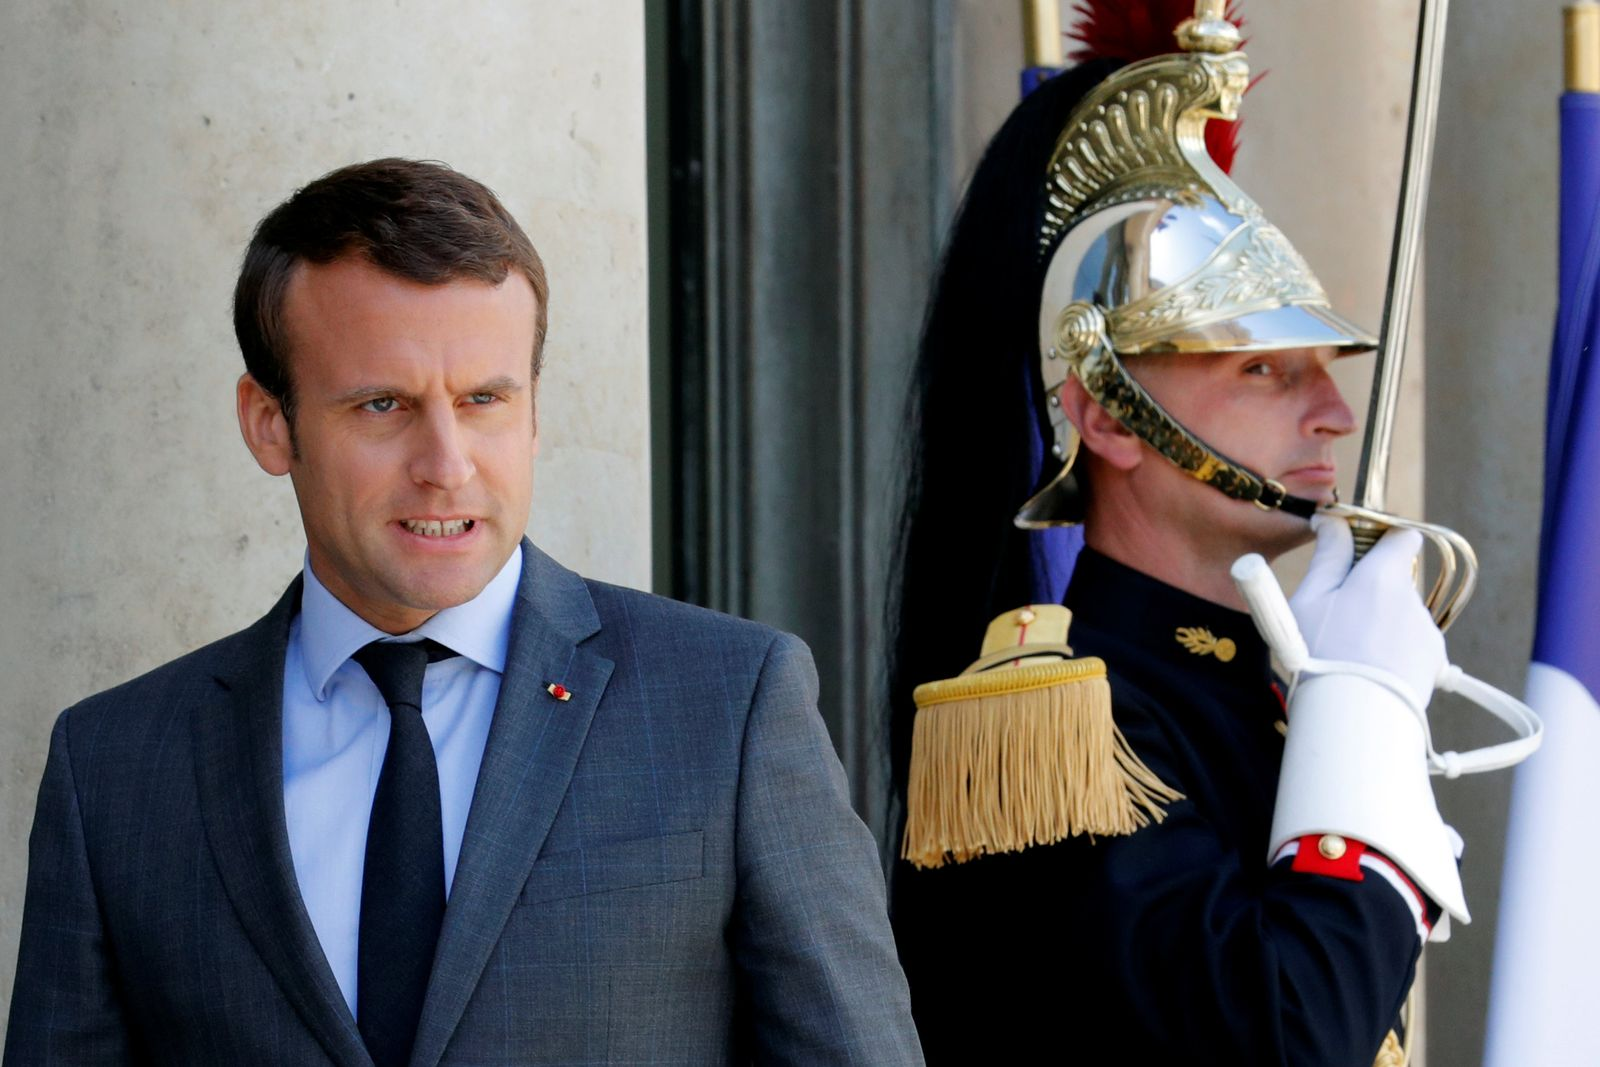 FRANCE-POLITICS/